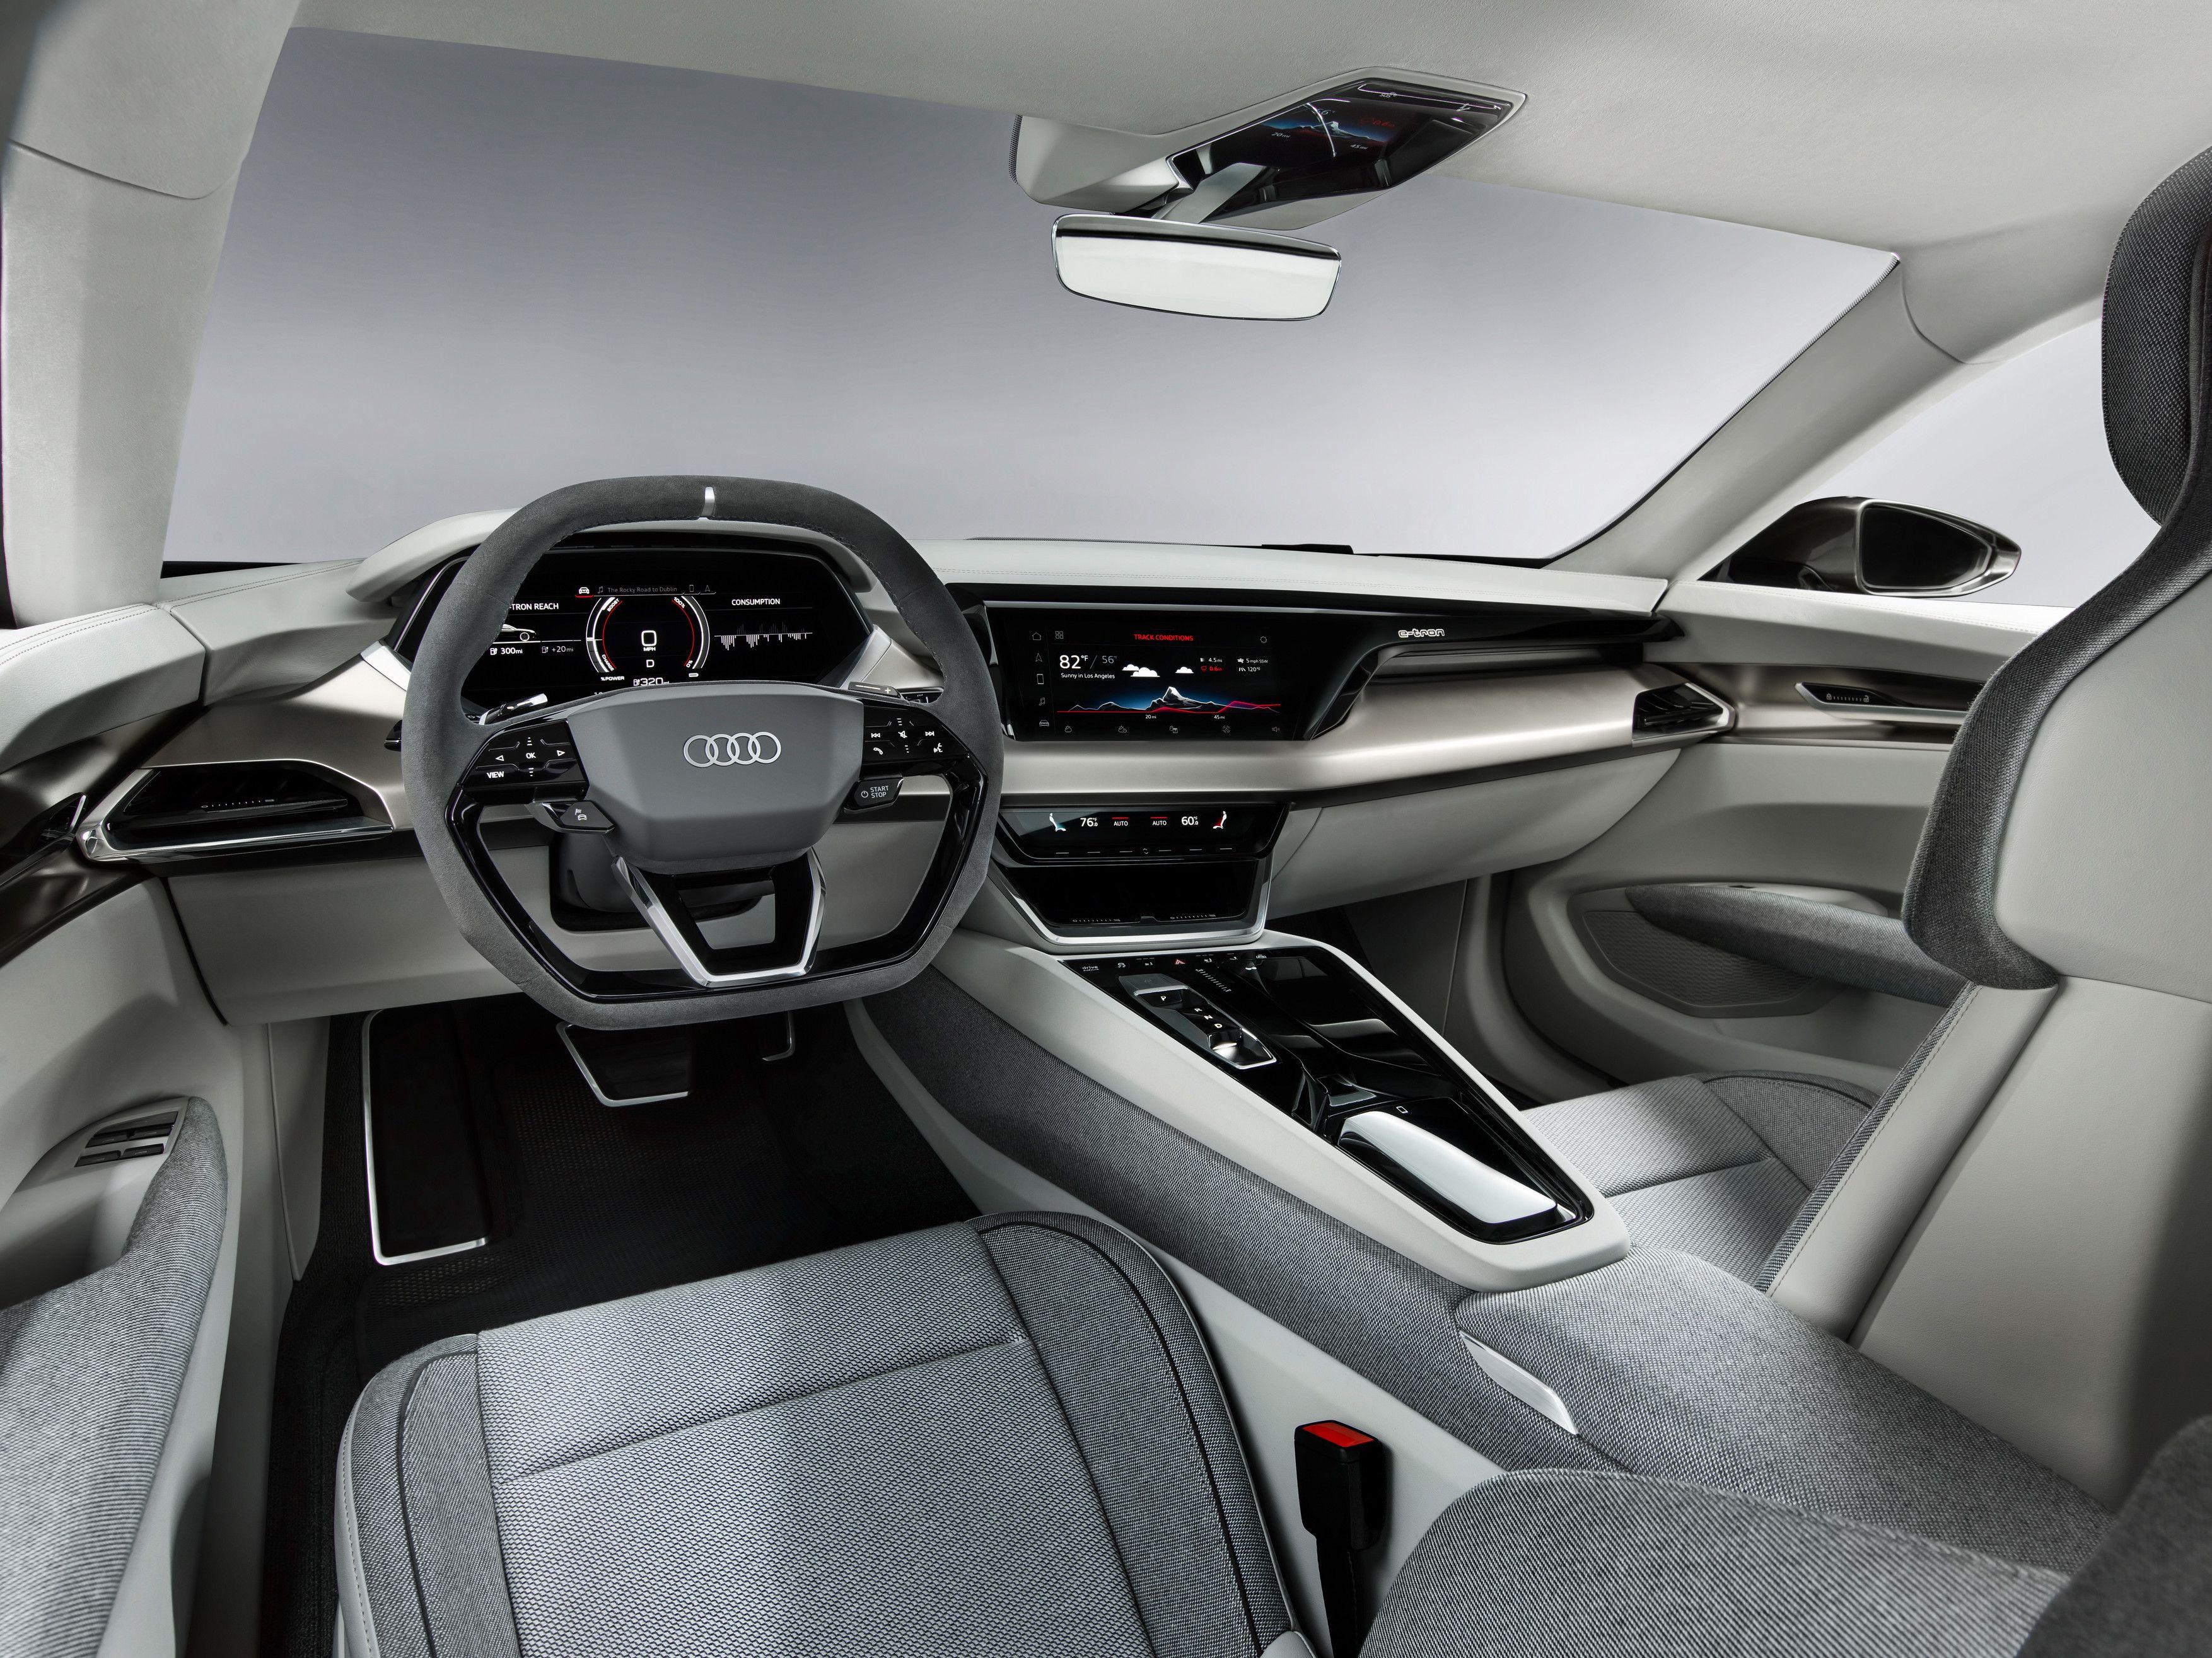 Audi E Tron Gt Concept Interior 4k Audi E Tron Gt Concept Interior View Audi E Tron Gt Concept Interior Hd 4k Audi E Tron Gt Concept Audi E Tron E Tron Audi